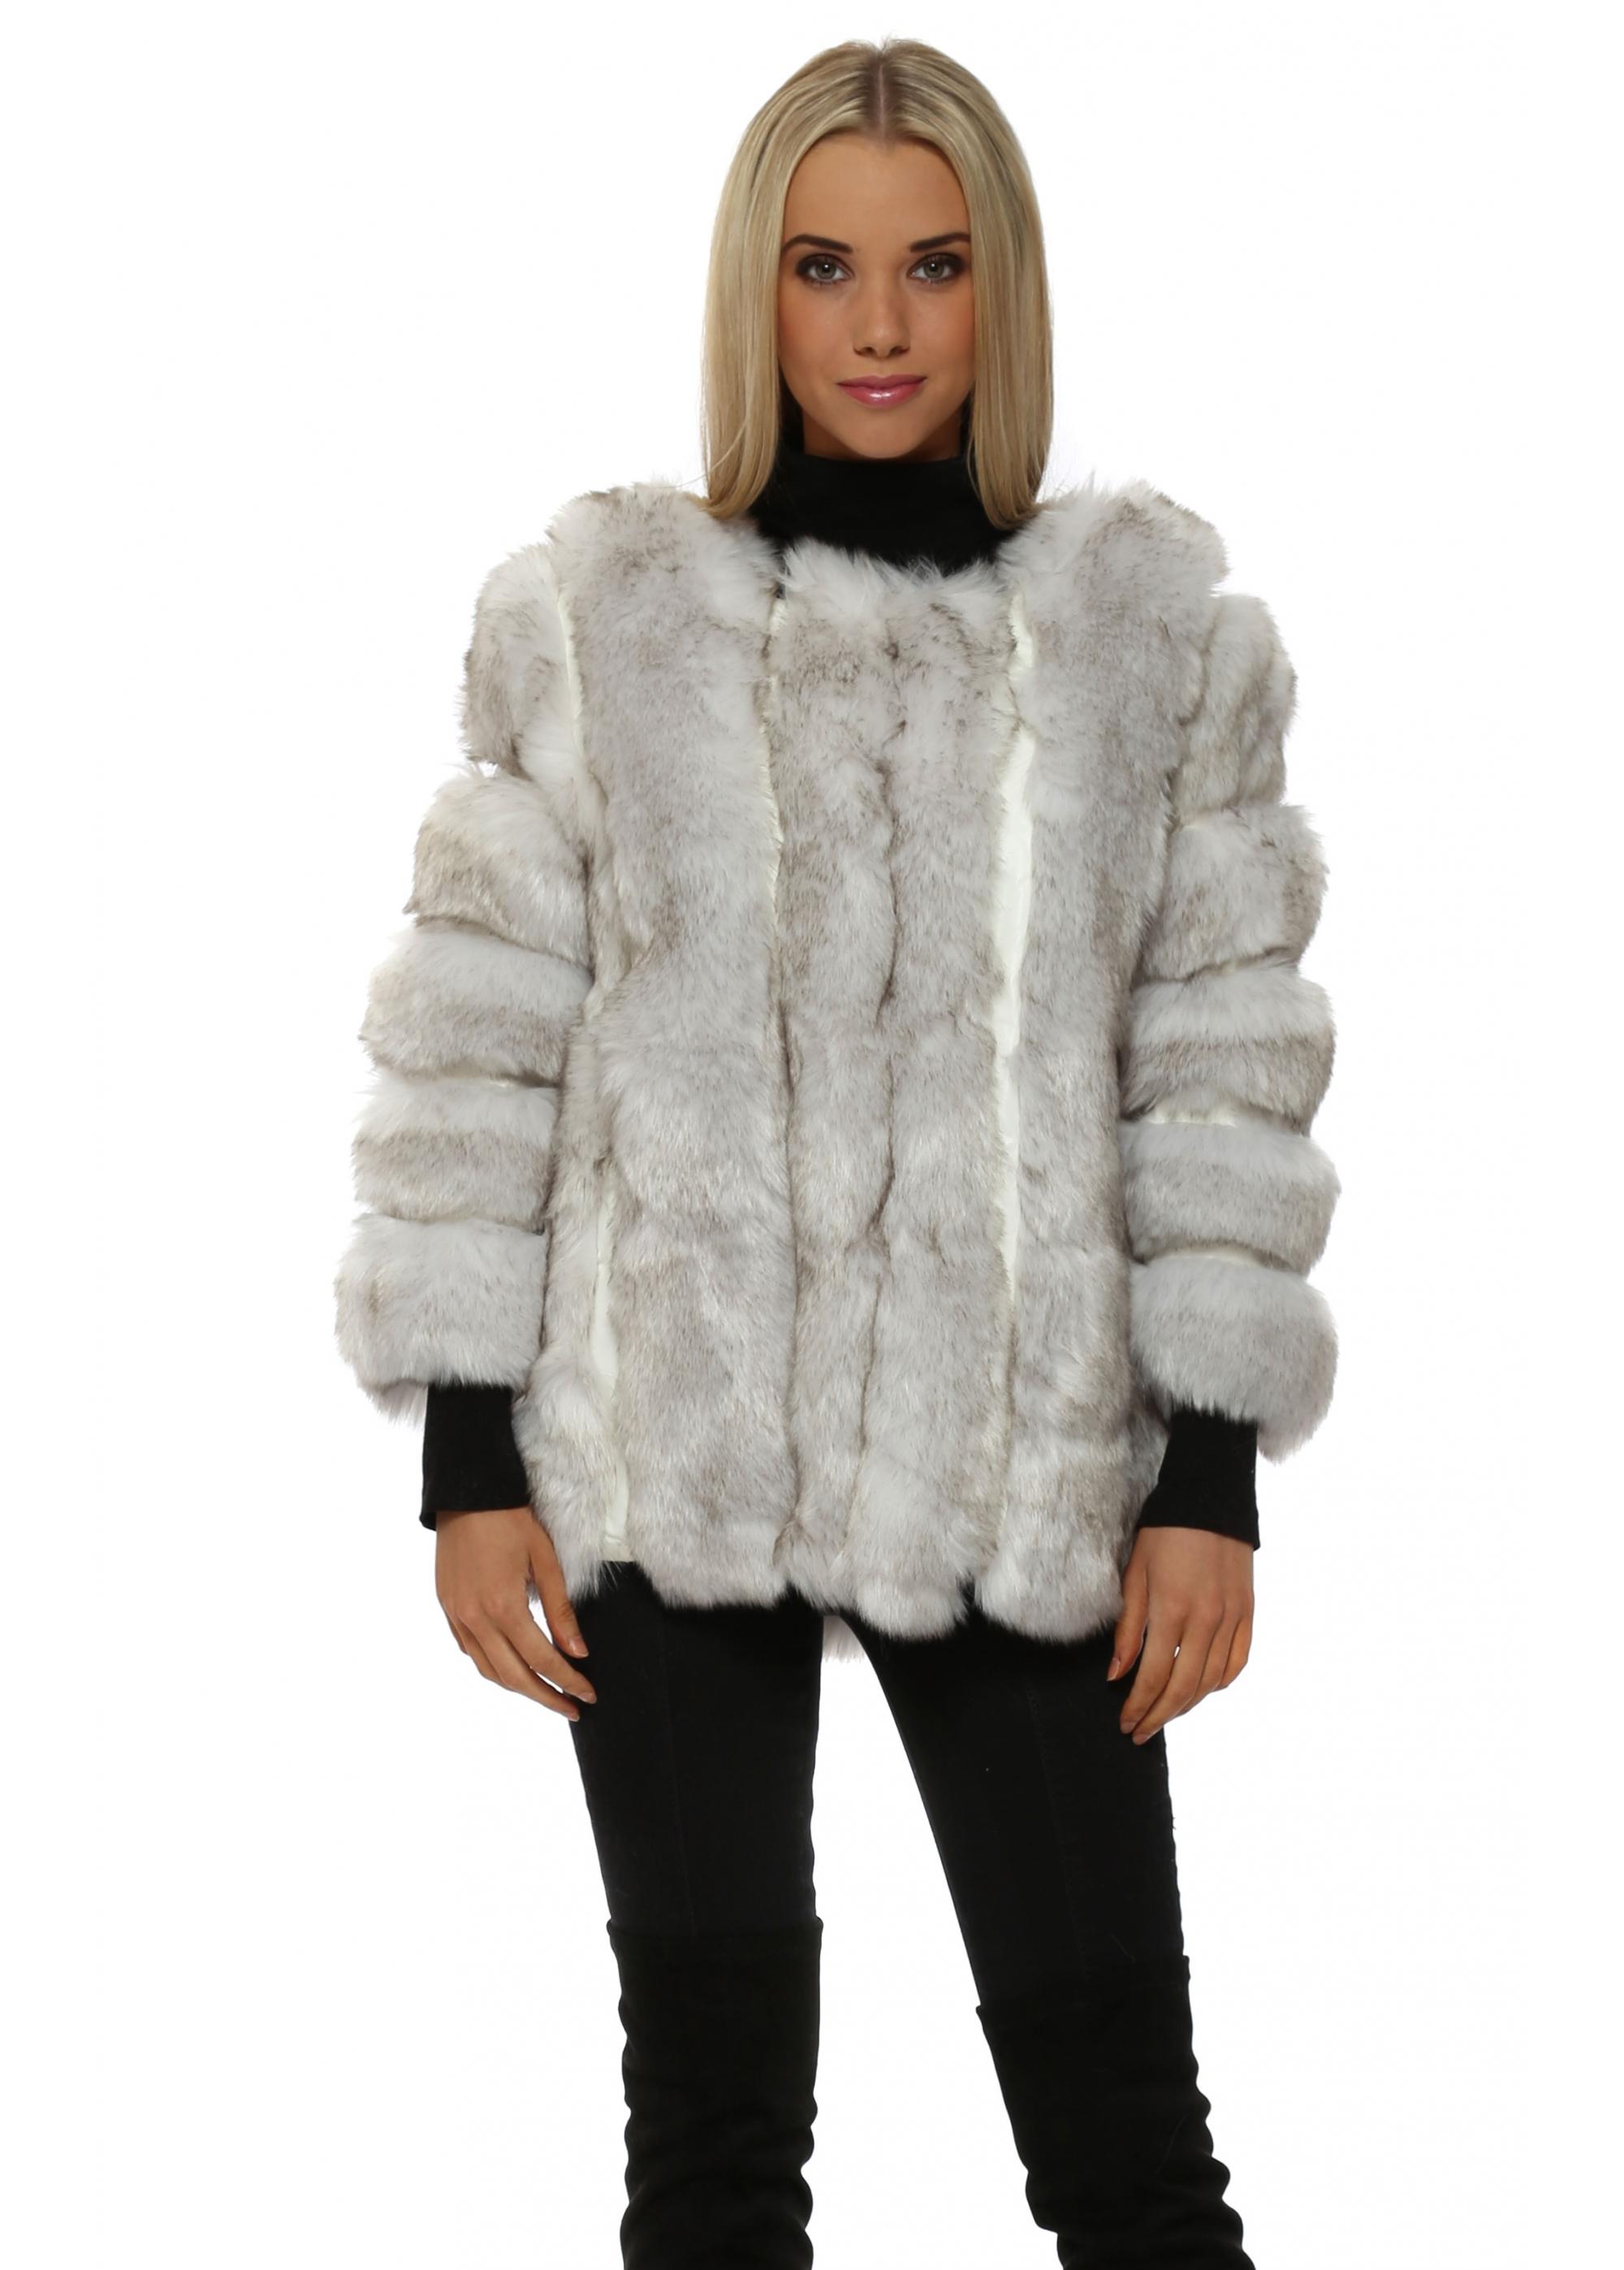 3123a6a1a JayLey Winter White Luxe Faux Fox Fur Coat